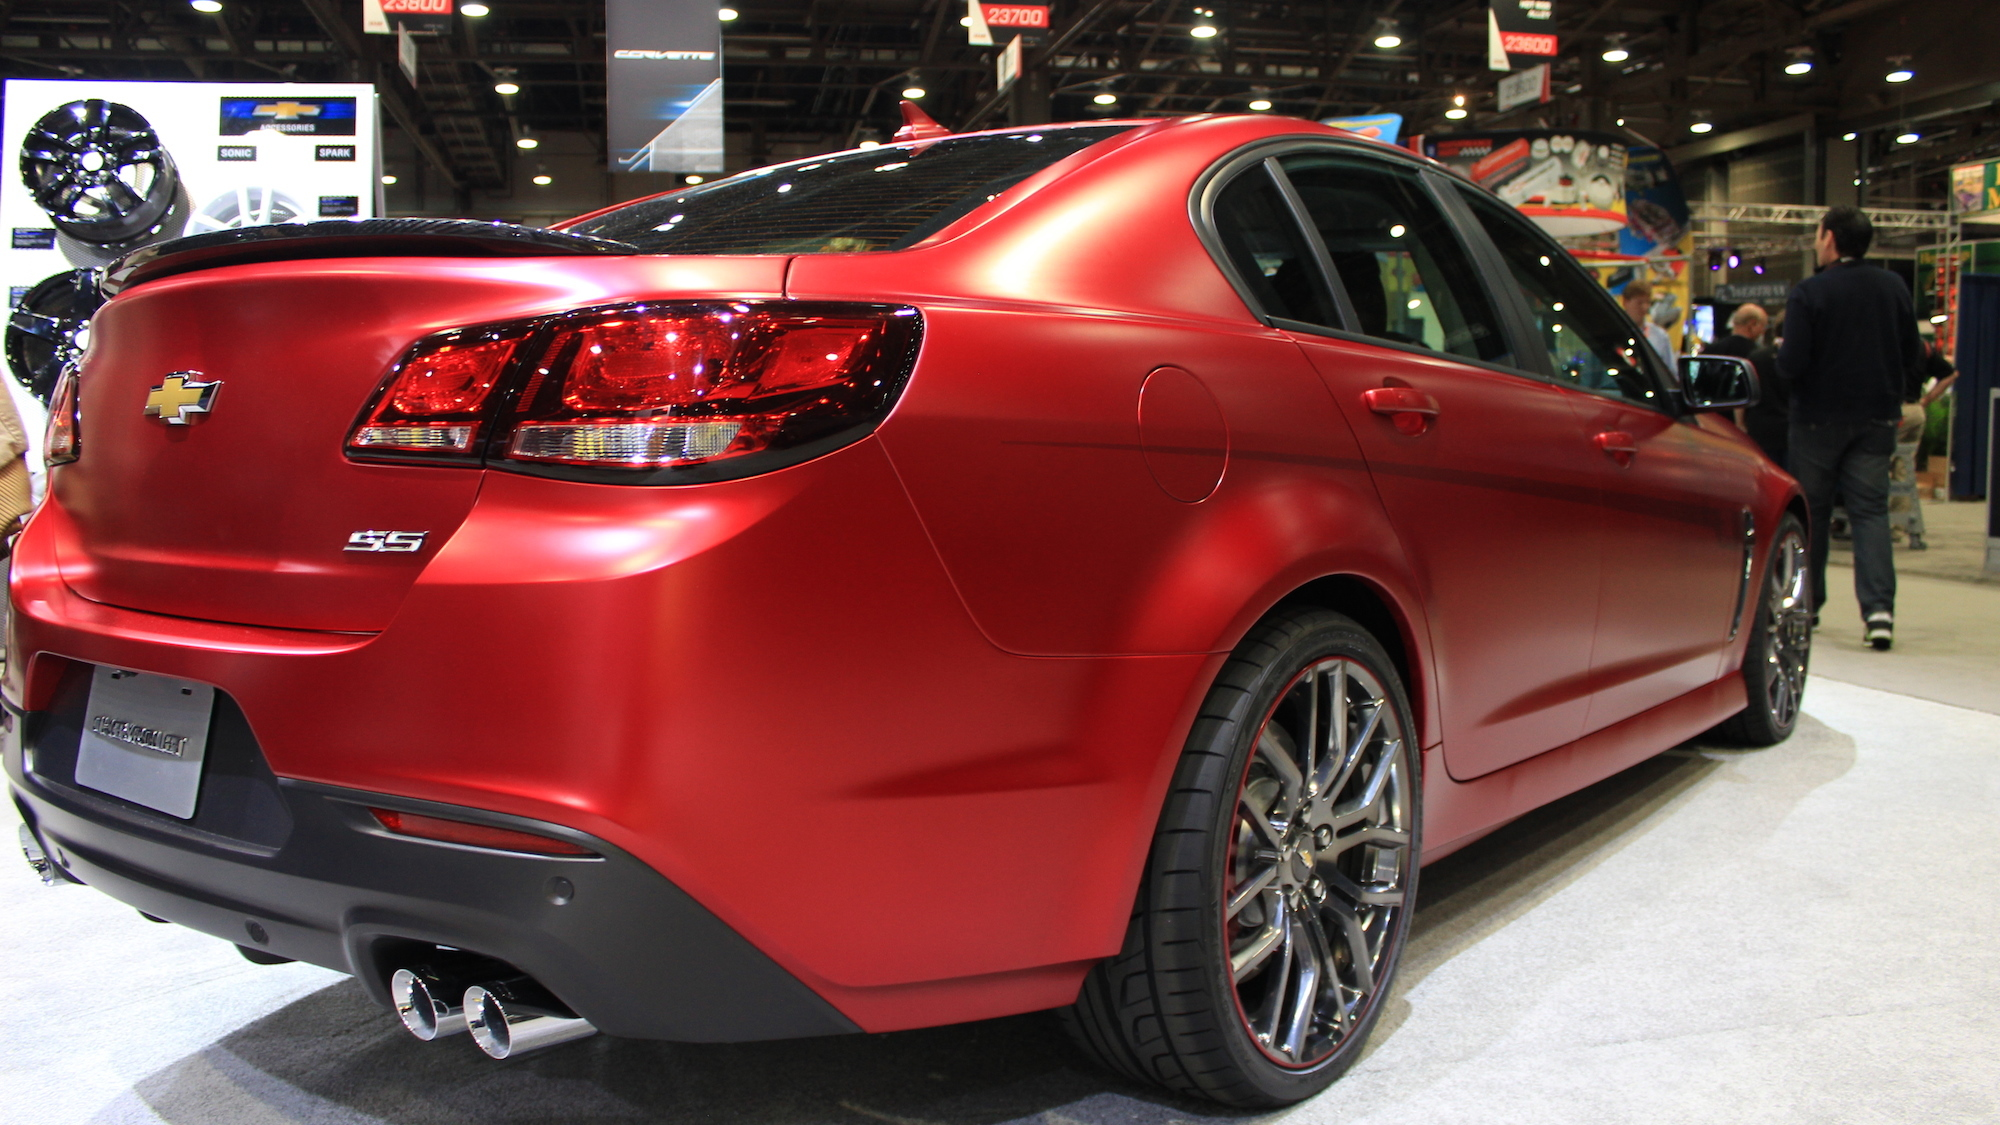 Chevrolet SS Performance Sedan Jeff Gordon Concept, 2013 SEMA Show